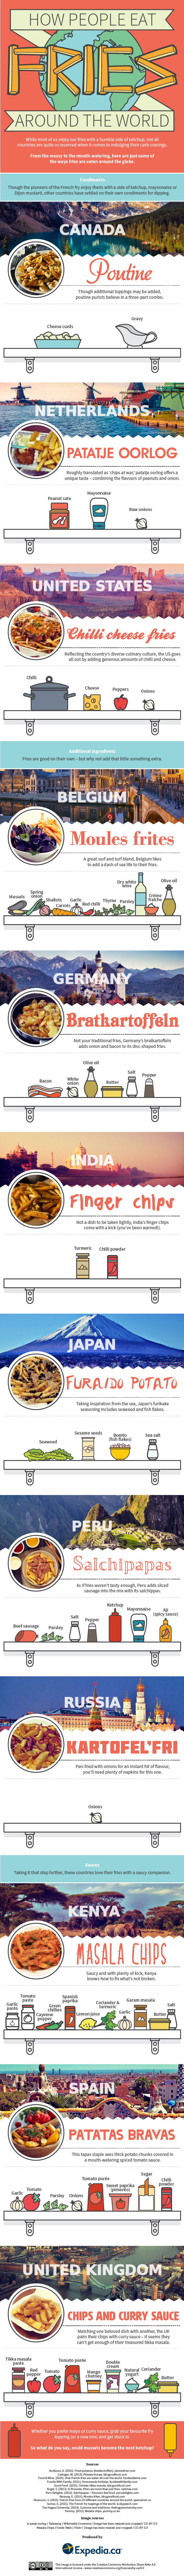 Comment mange-t'on ses frites selon le pays où l'on vit ?